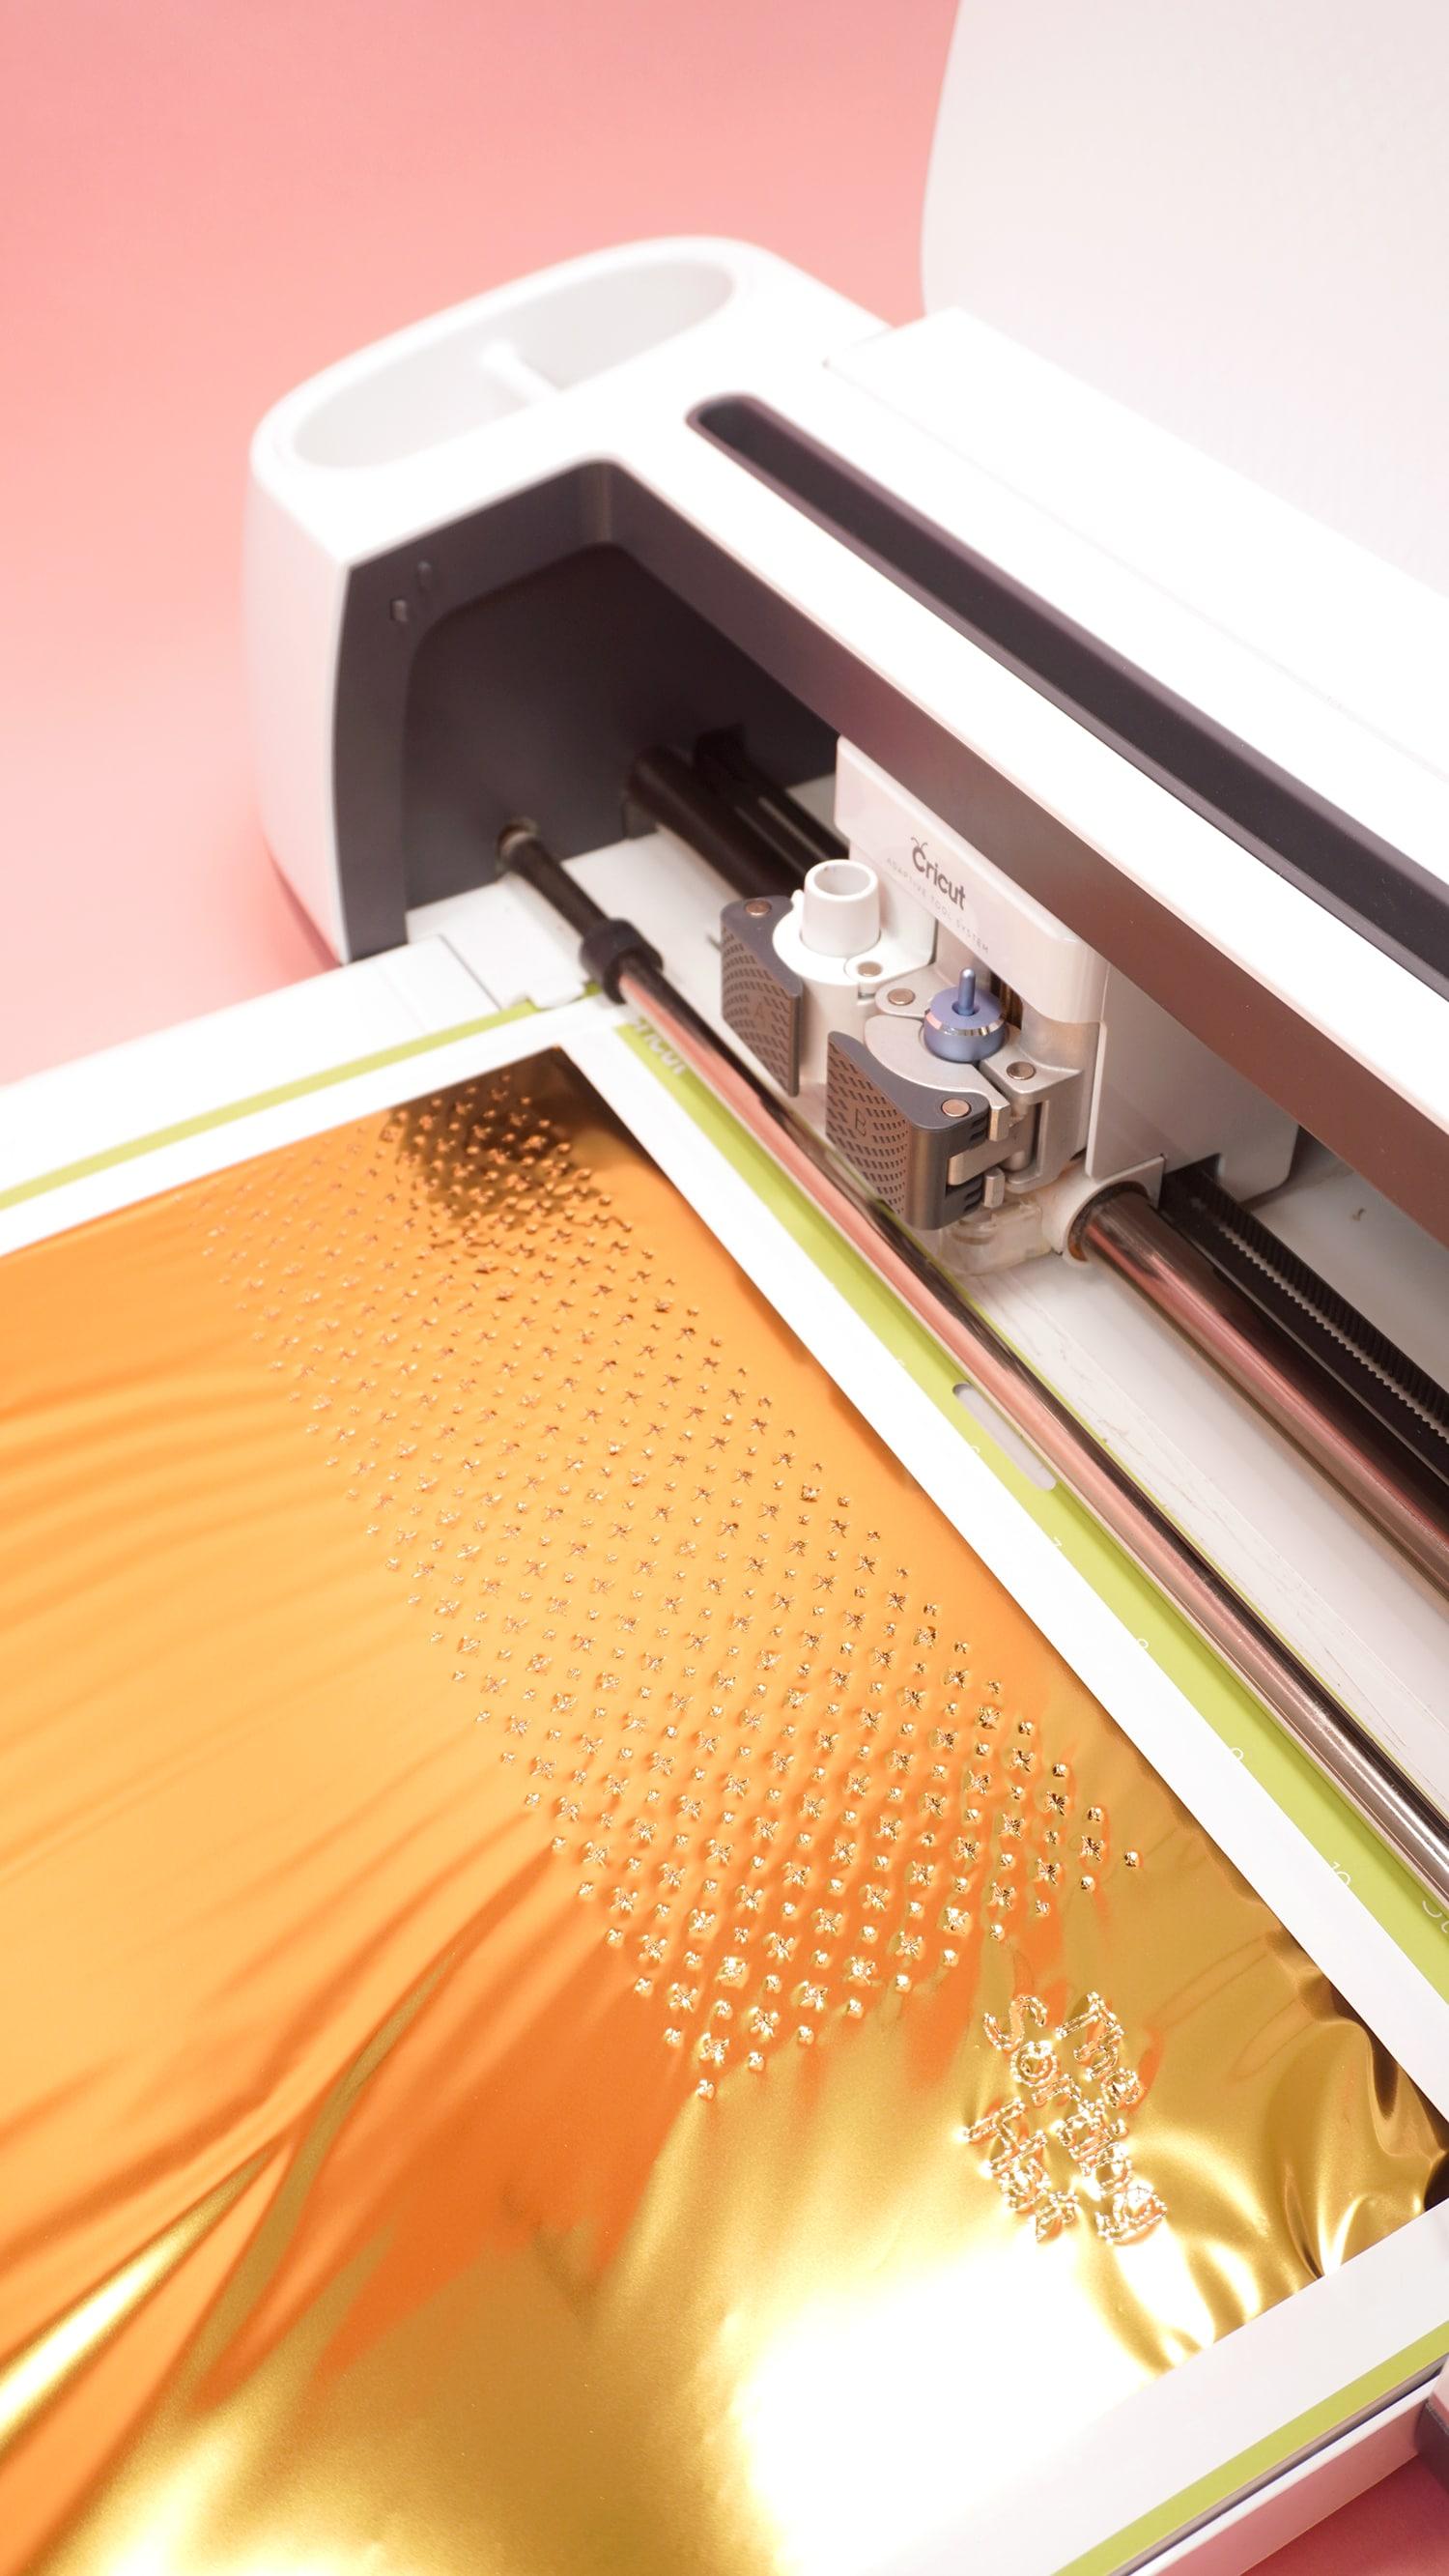 Cricut Gold Foil Transfer System on Mat in Cricut Maker